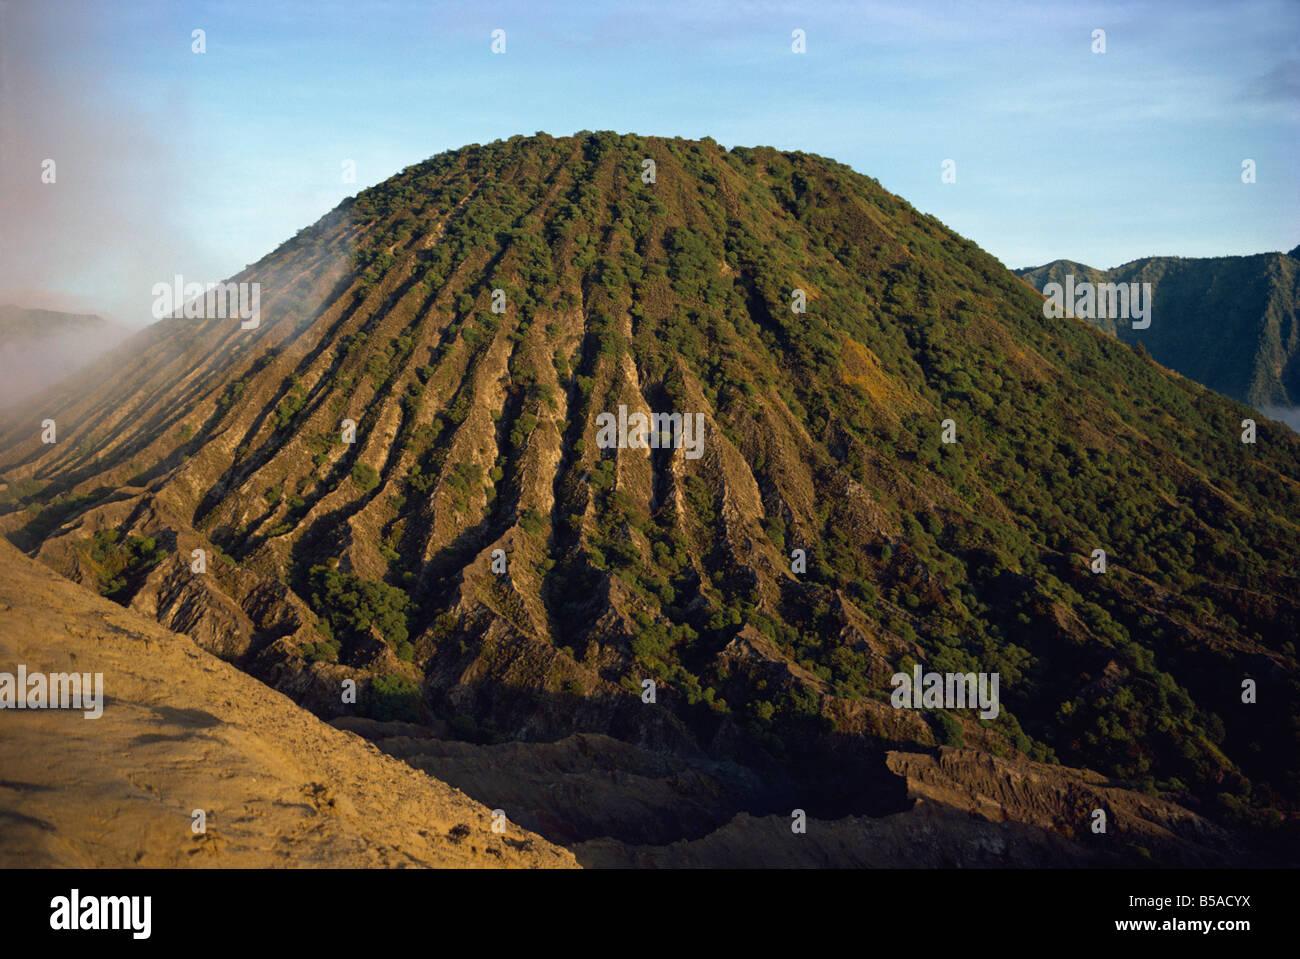 Mount Bromo Java Indonesia Southeast Asia Asia - Stock Image